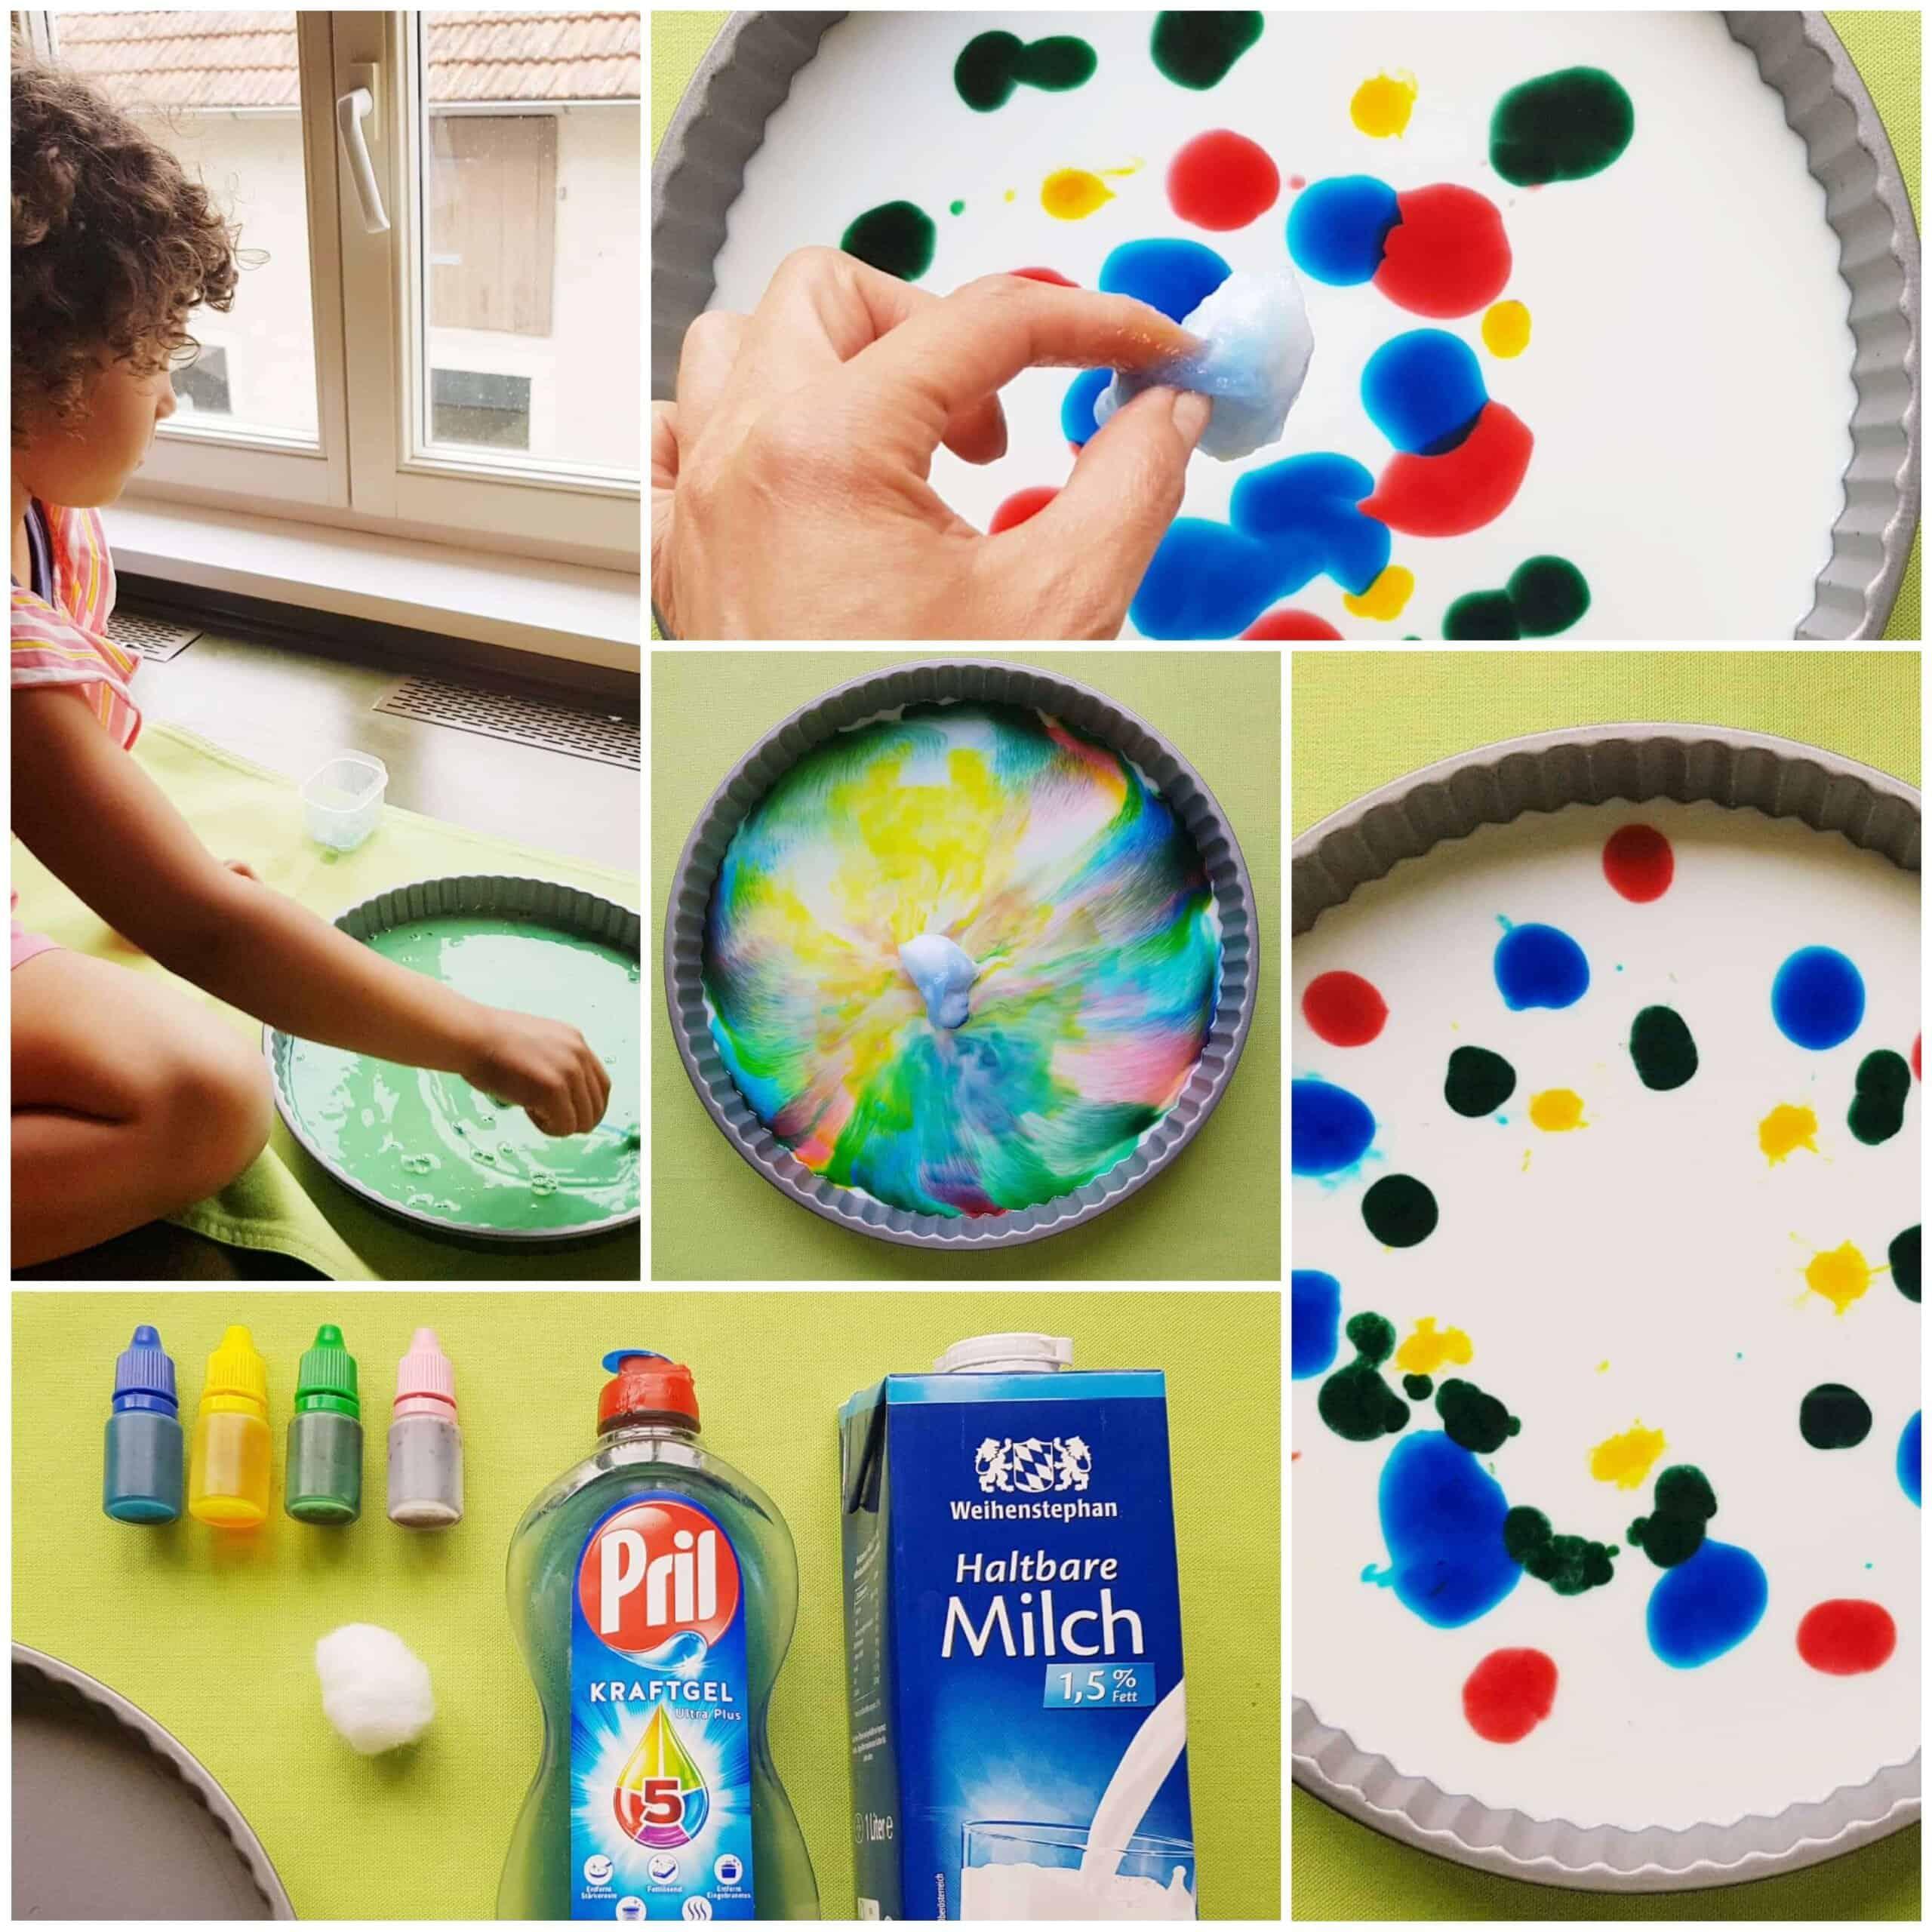 milk dish soap kitchen experiment